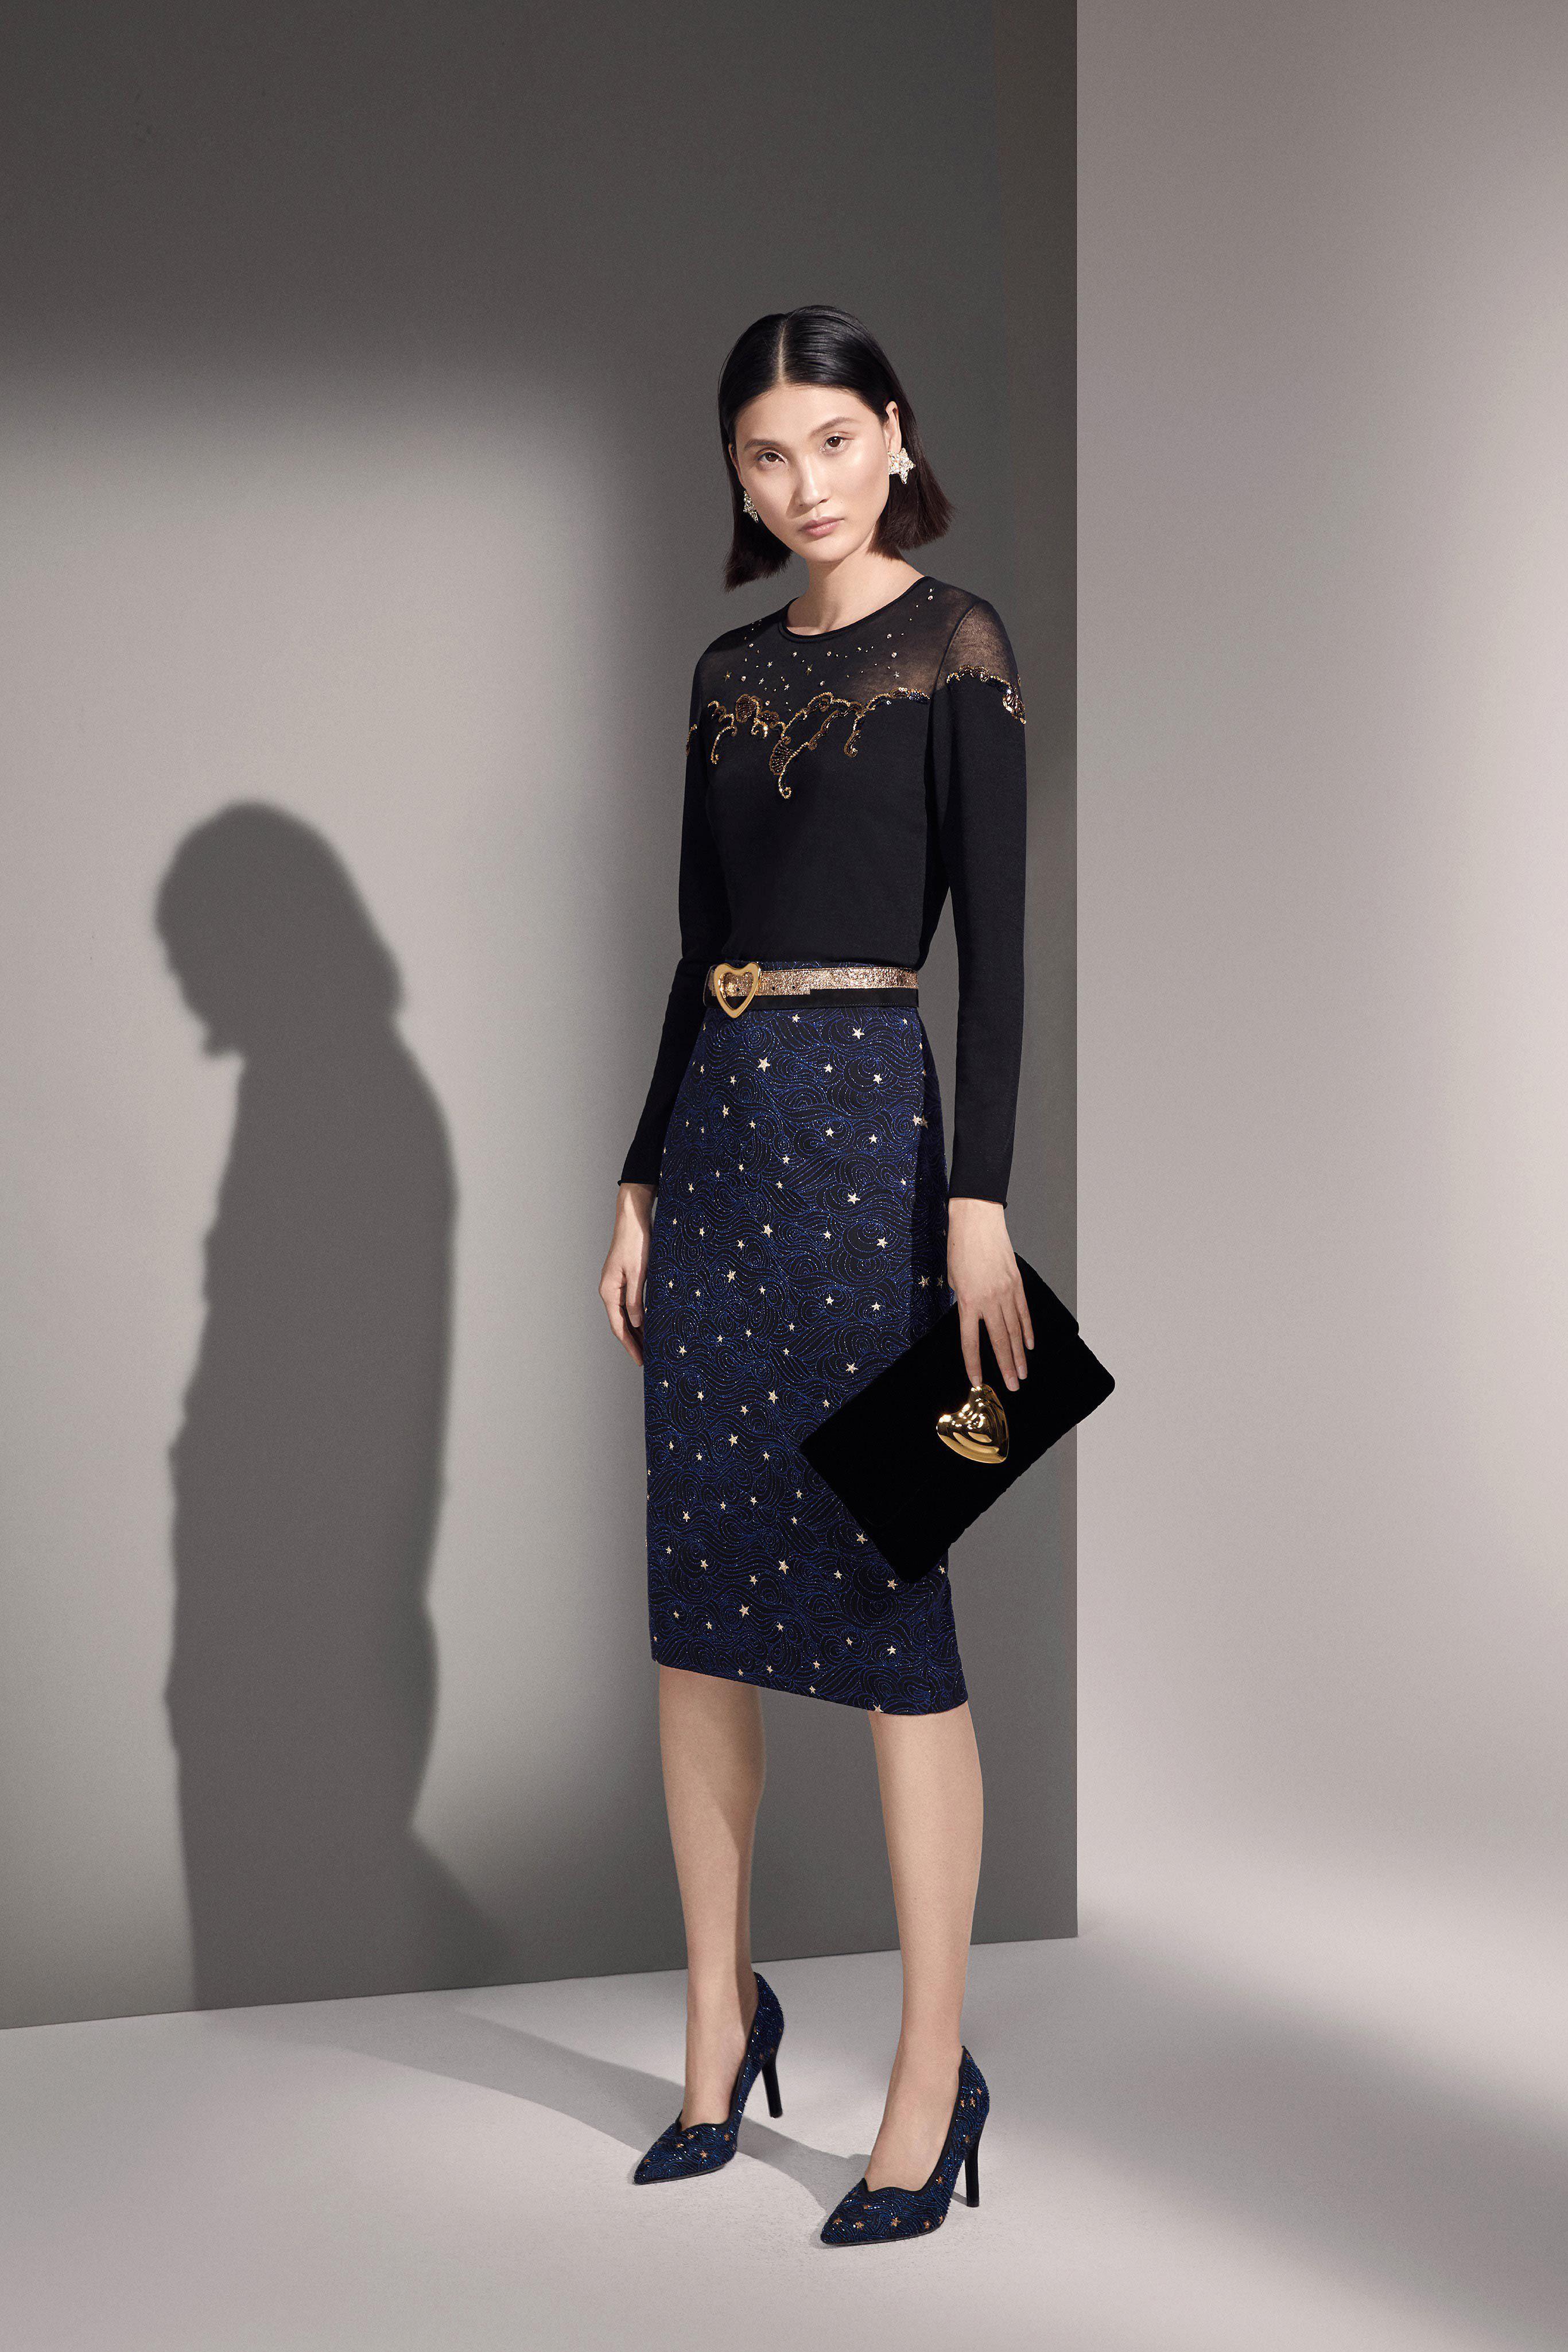 0f77b5d942a0 Escada Resort 2019 Fashion Show Collection  See the complete Escada Resort  2019 collection. Look 31